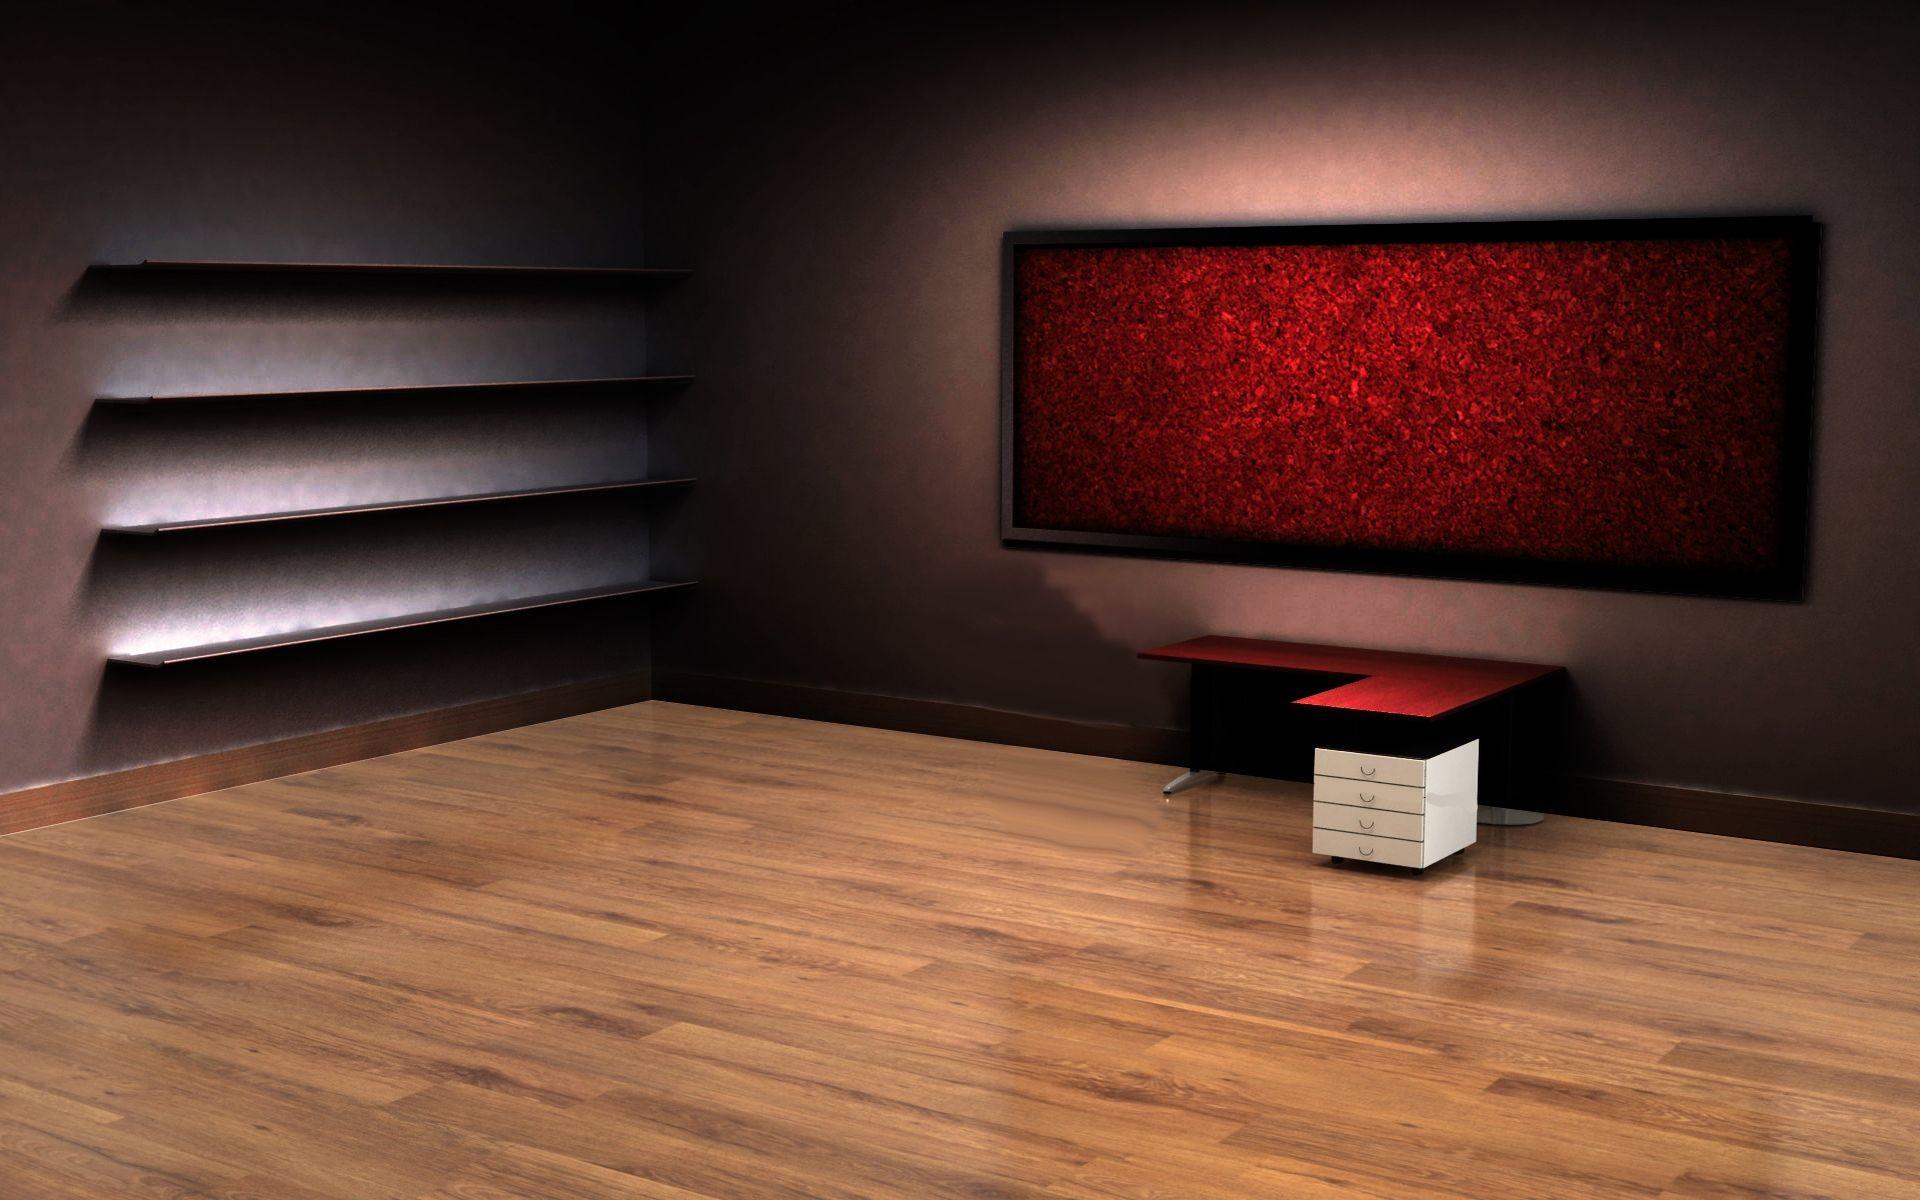 1920x1200 3d Empty Room Desktop Wallpaper